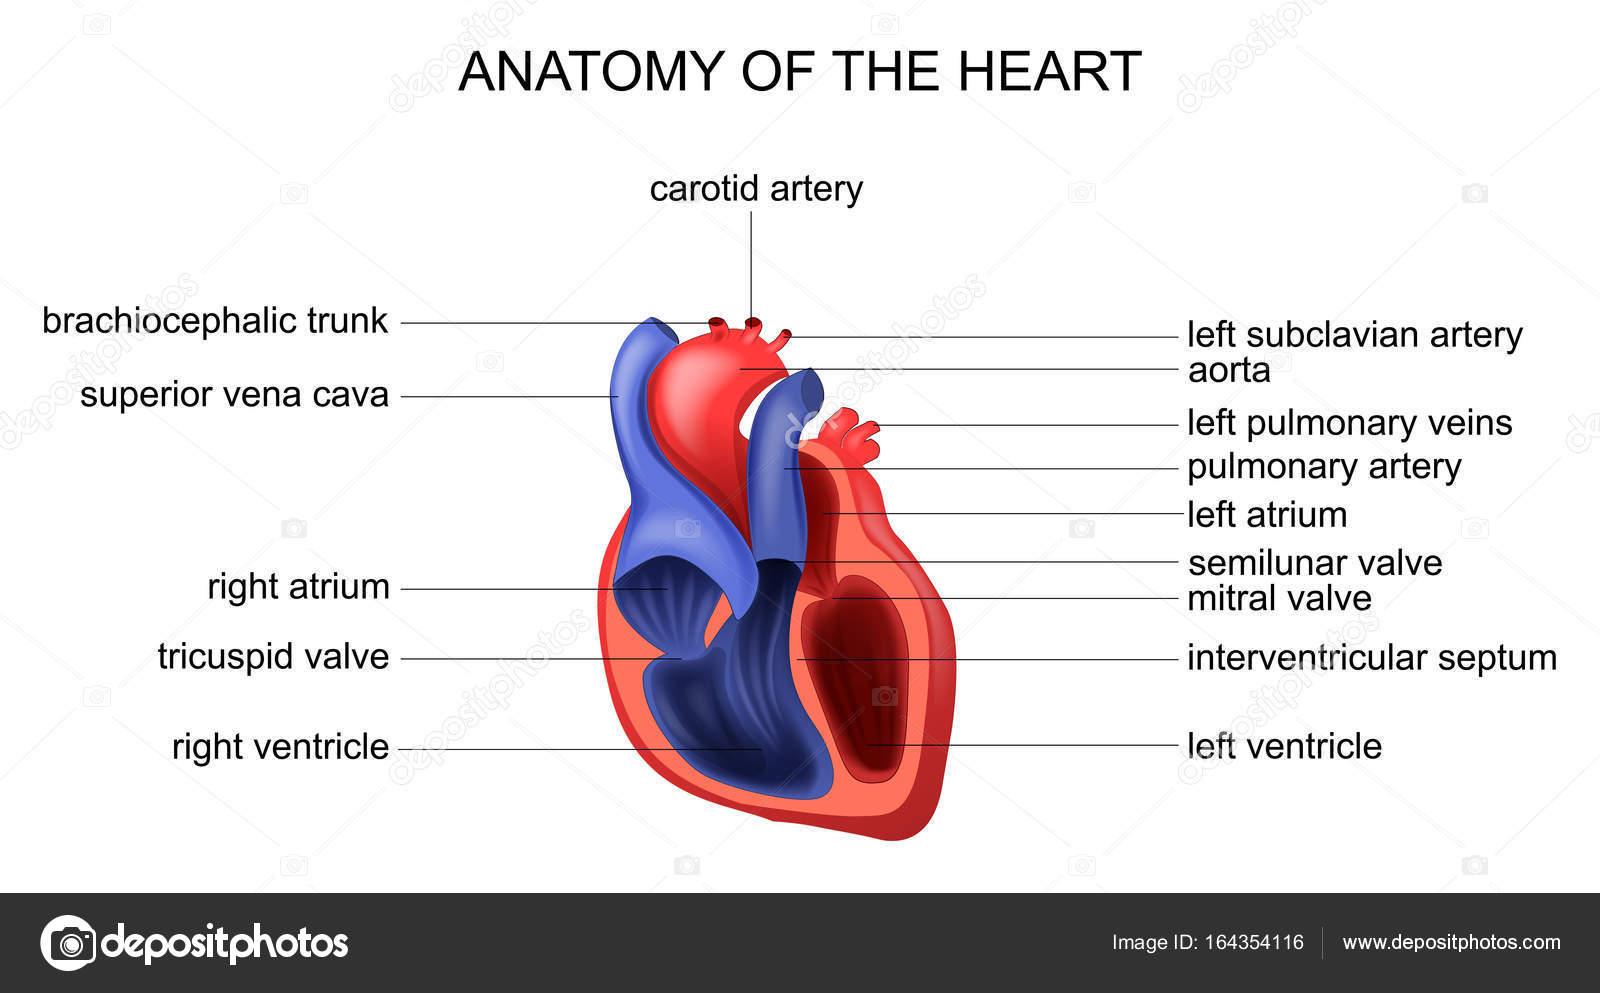 Anatomie des Herzens — Stockvektor © Artemida-psy #164354116